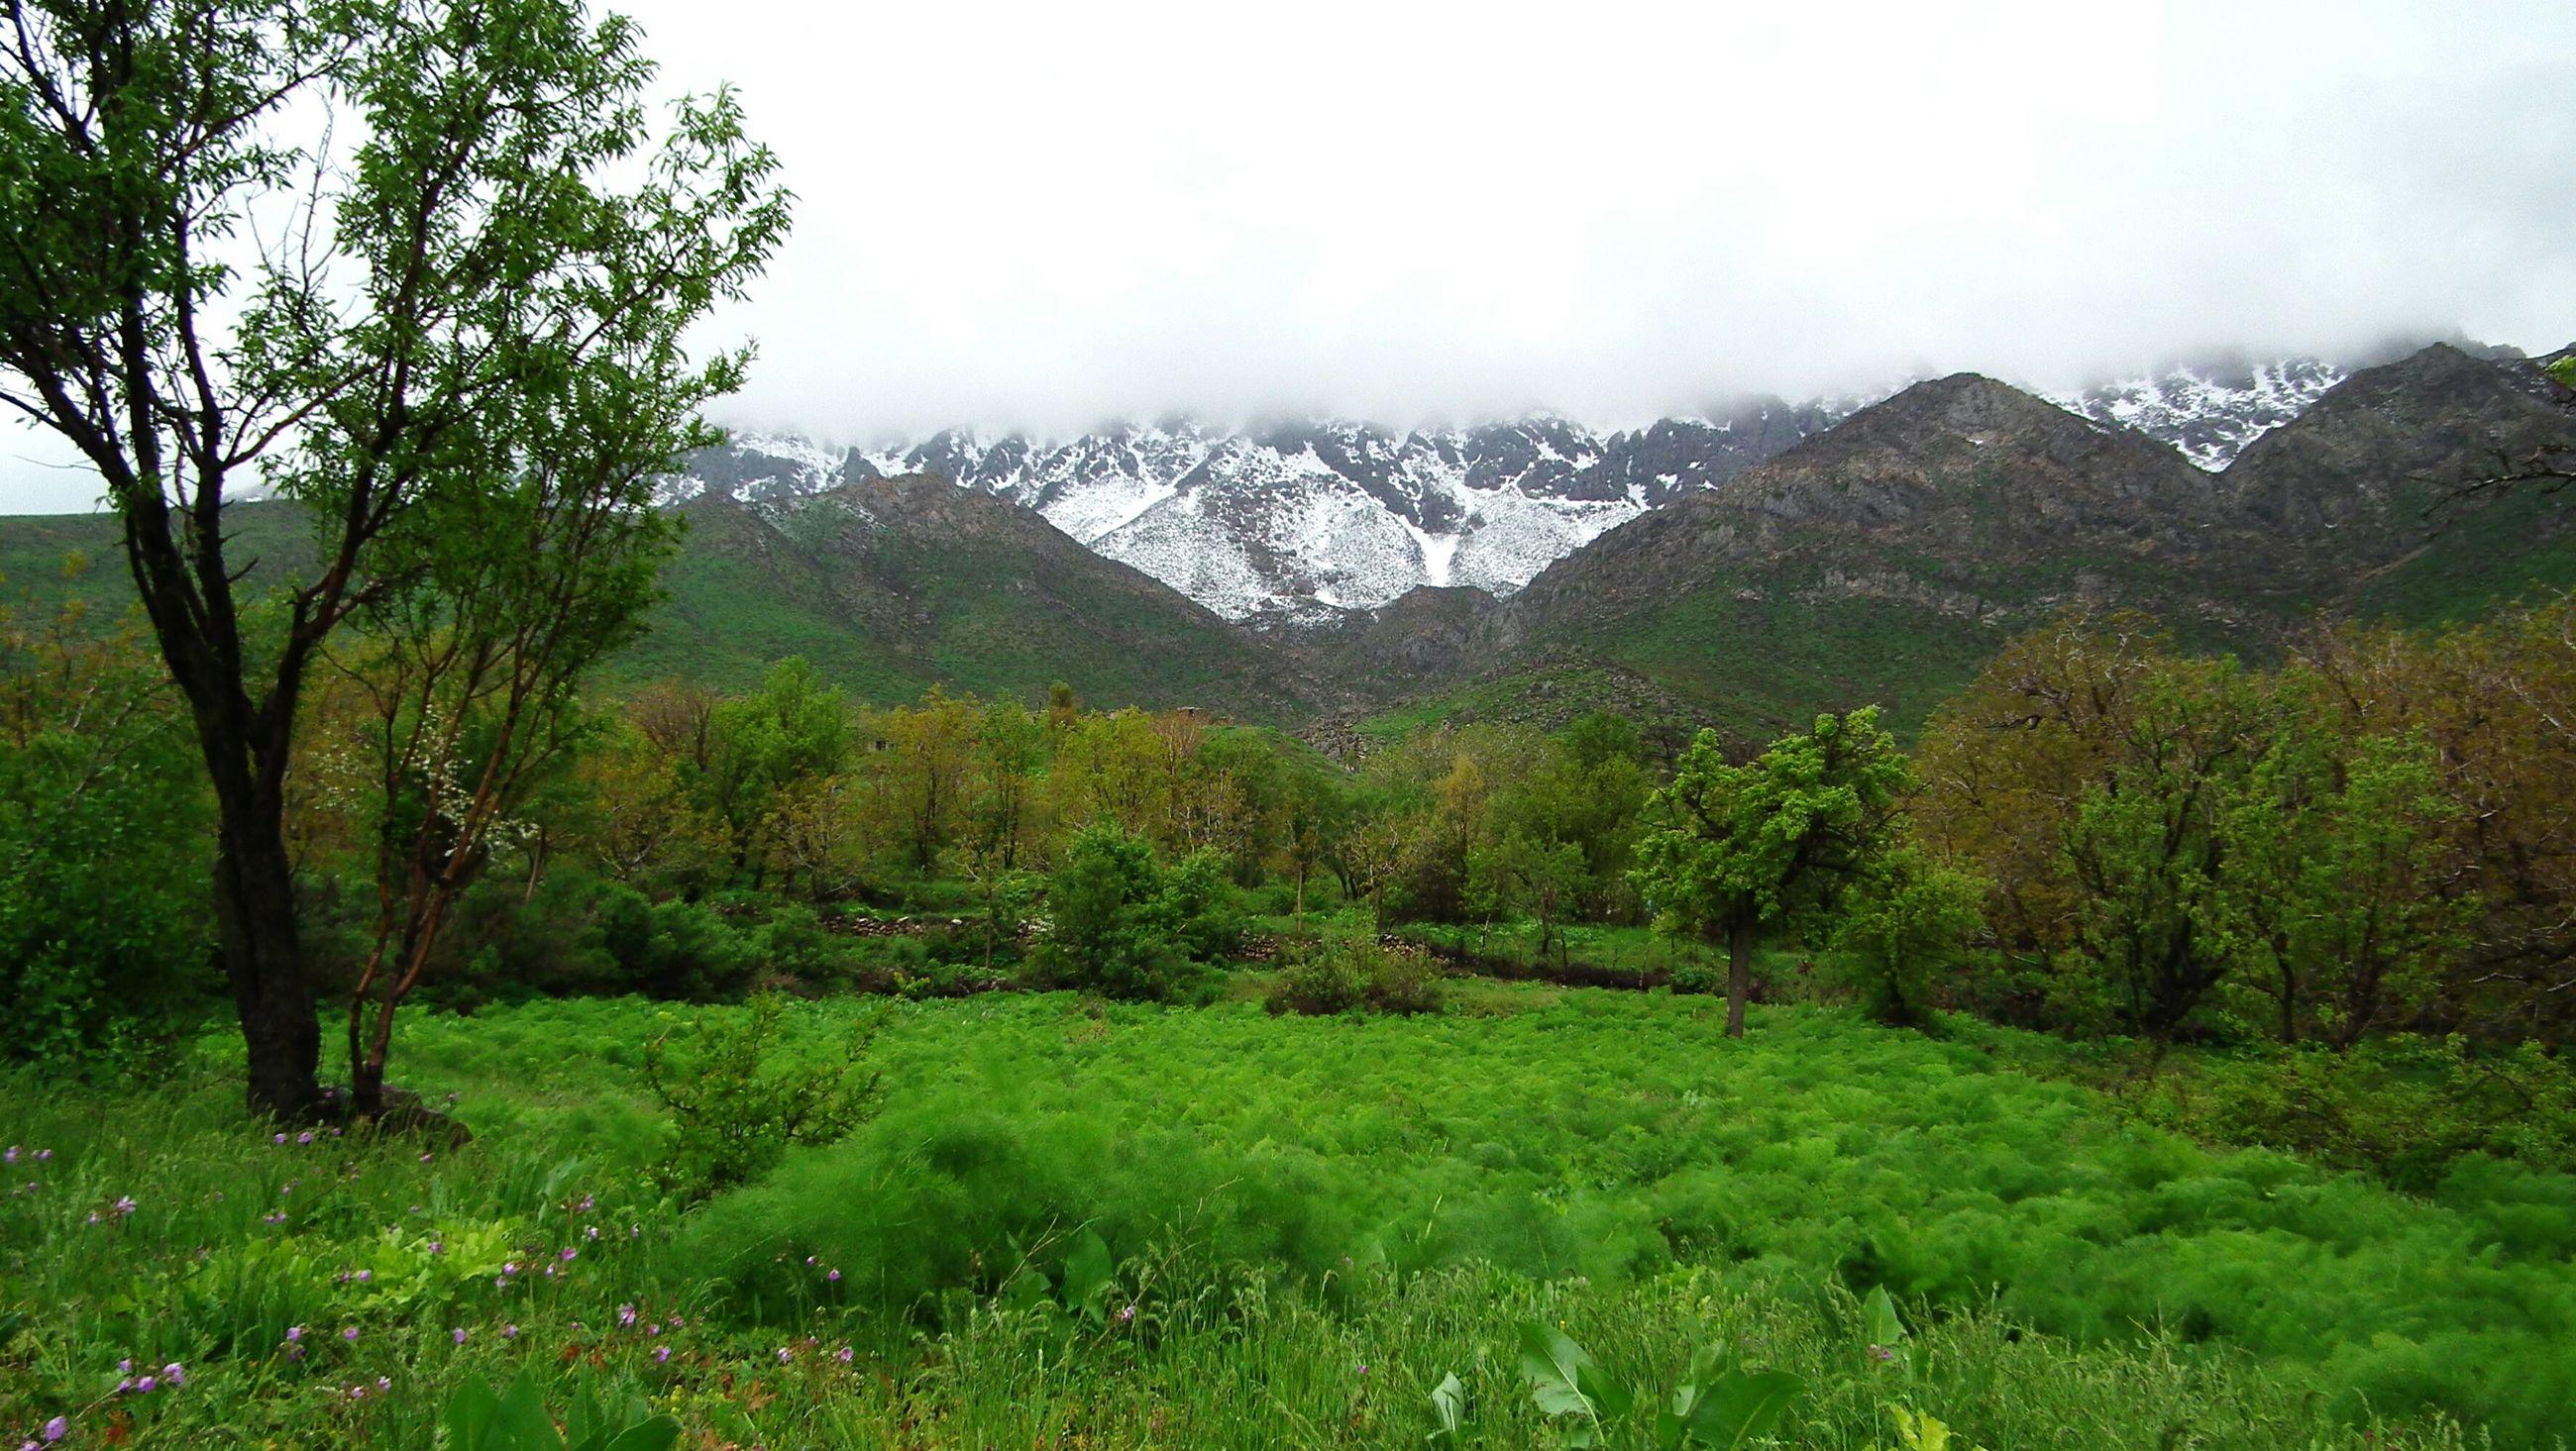 mountain, tree, tranquil scene, tranquility, scenics, beauty in nature, landscape, mountain range, grass, green color, nature, growth, non-urban scene, sky, lush foliage, idyllic, remote, grassy, day, green